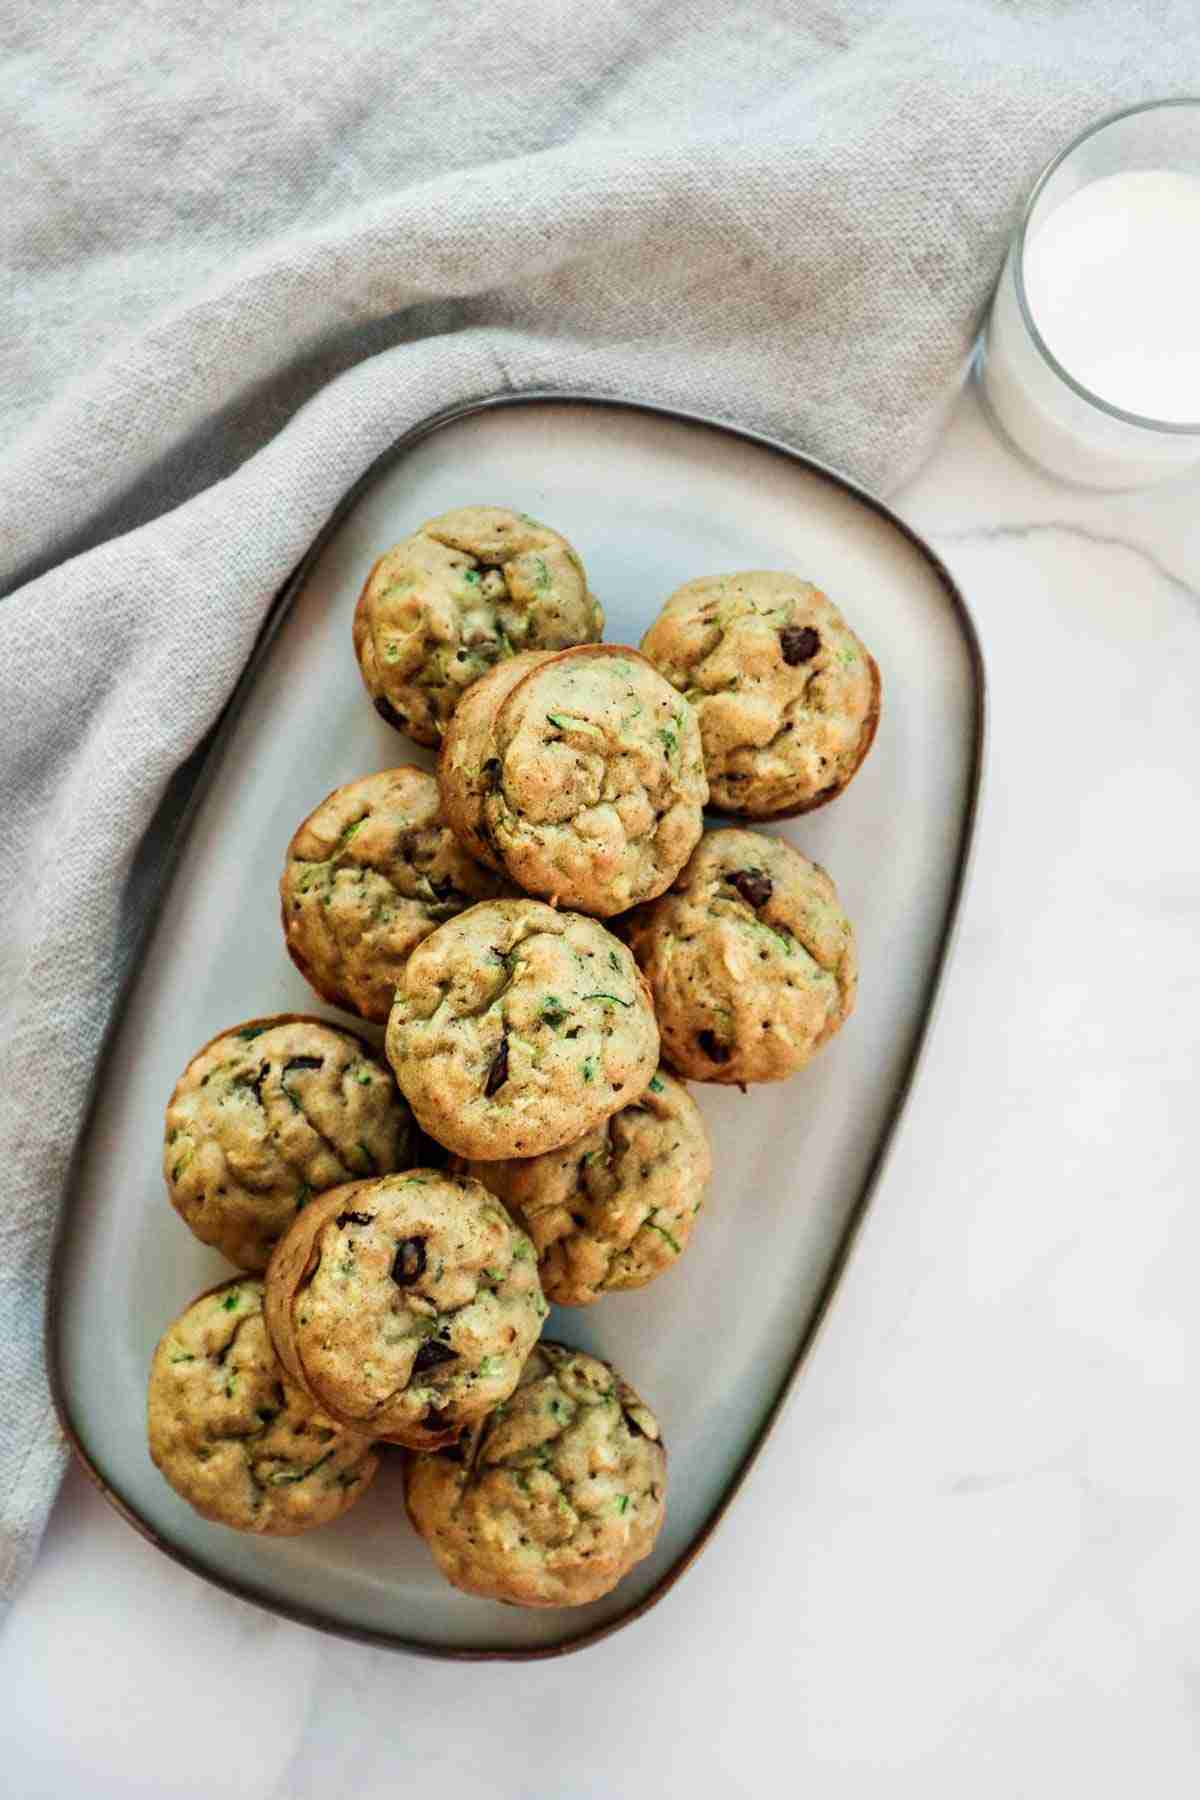 Recette de meal prep à congeler: Muffins au zucchini (courgettes)